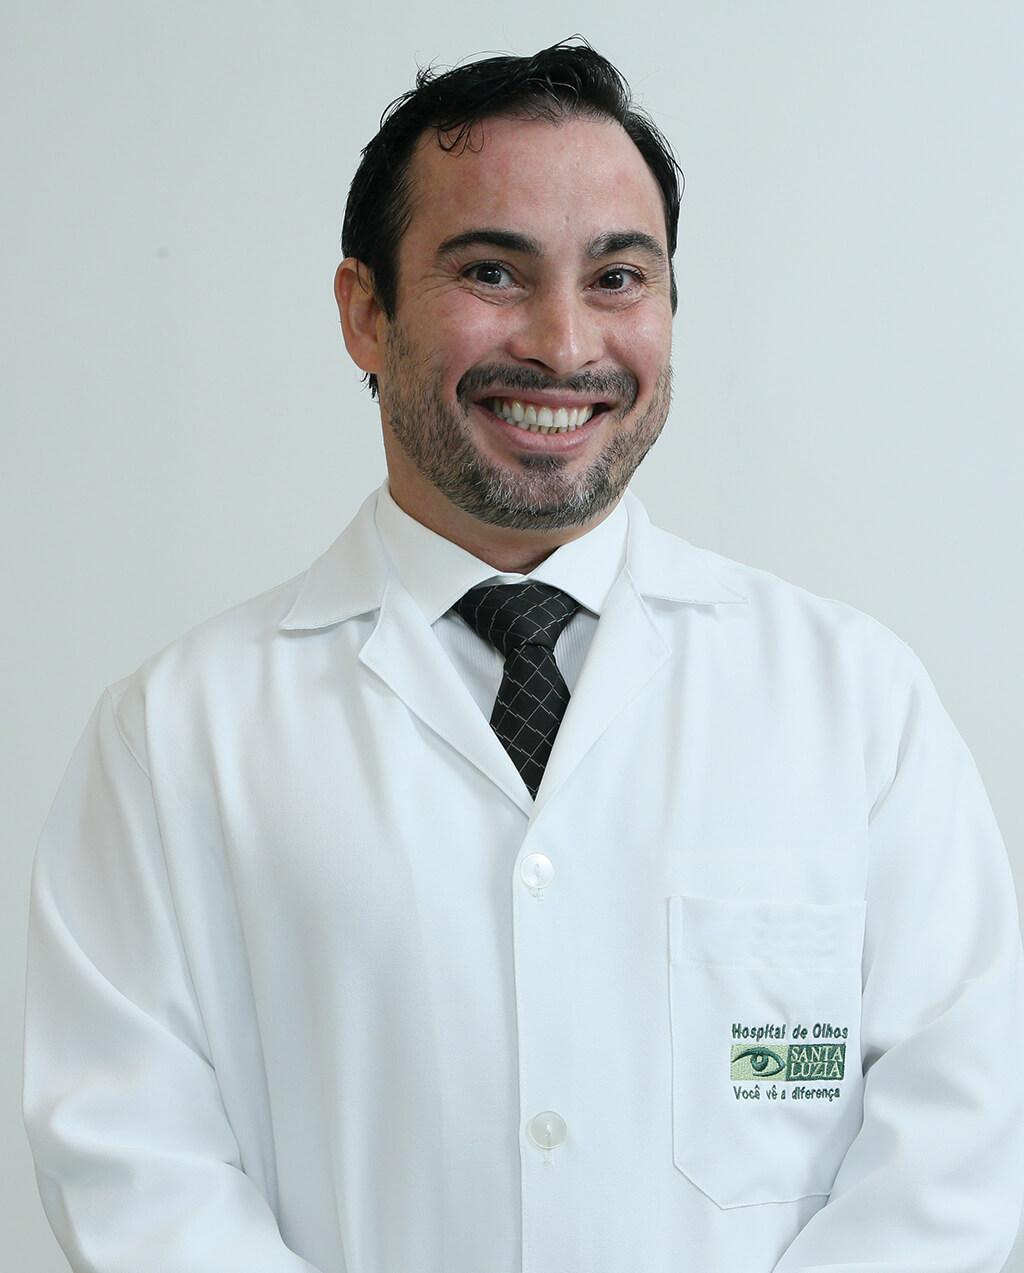 Luiz Guilherme Freitas